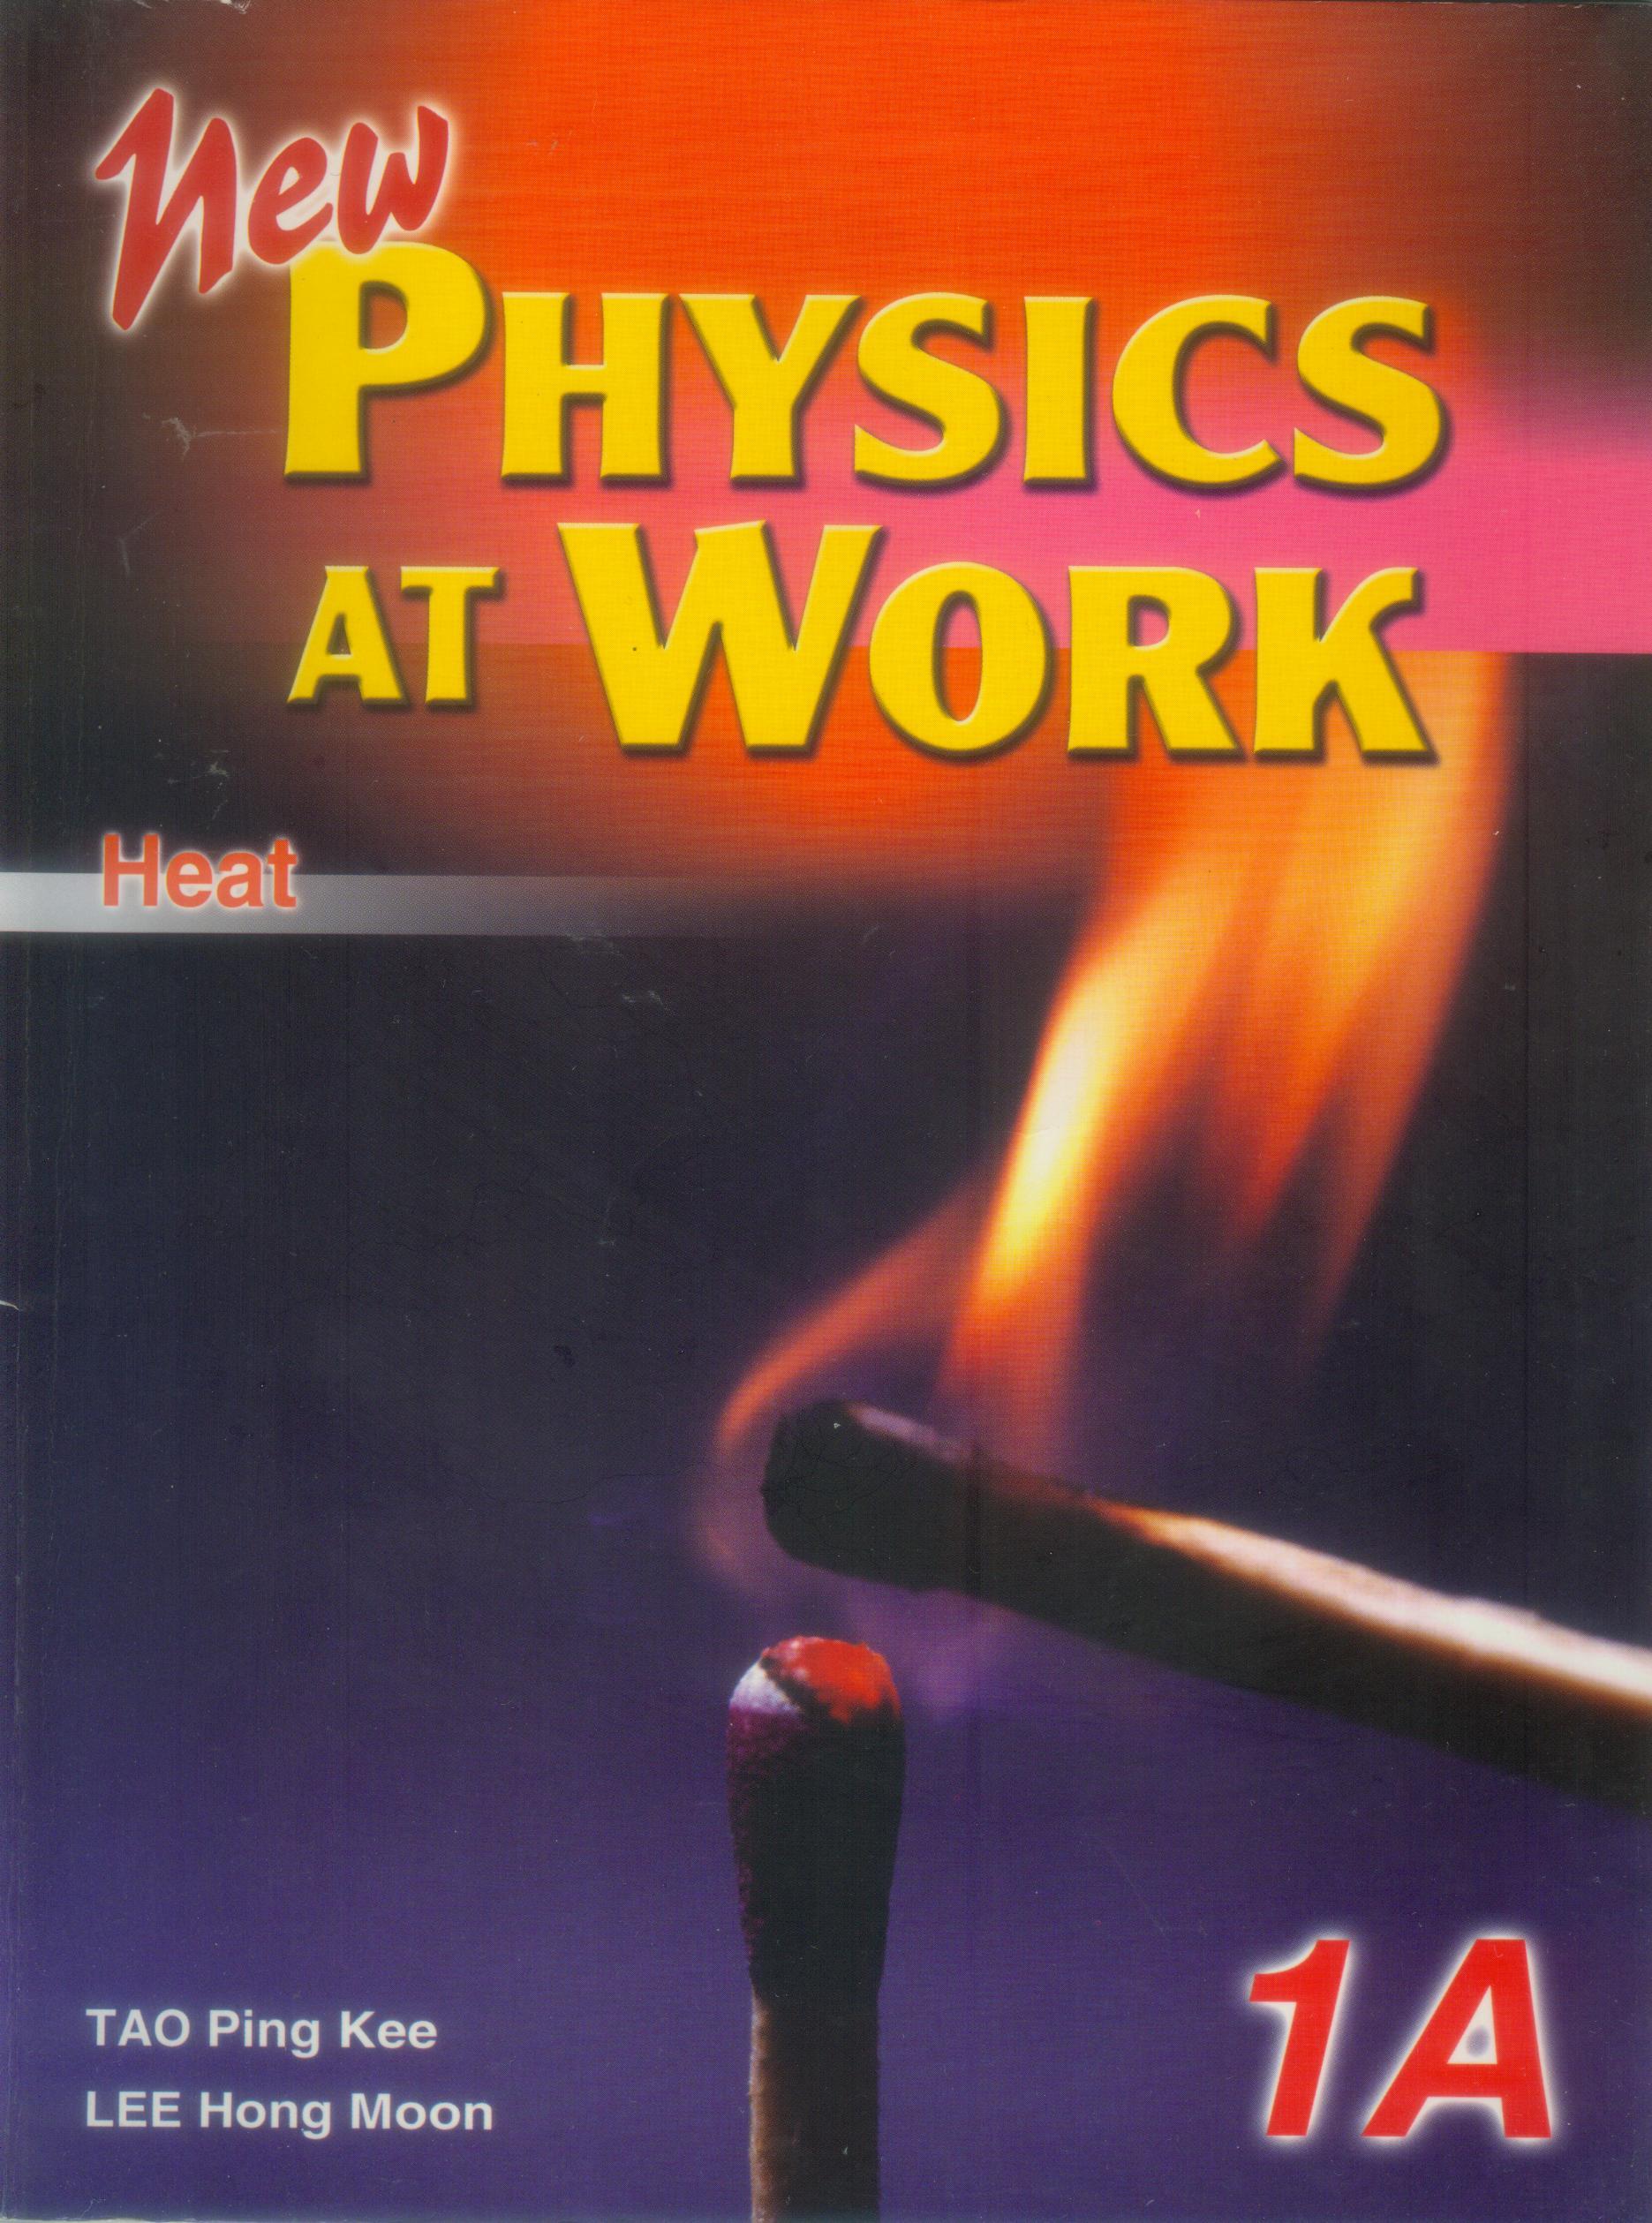 NewPhysics At Work 1A - Heat